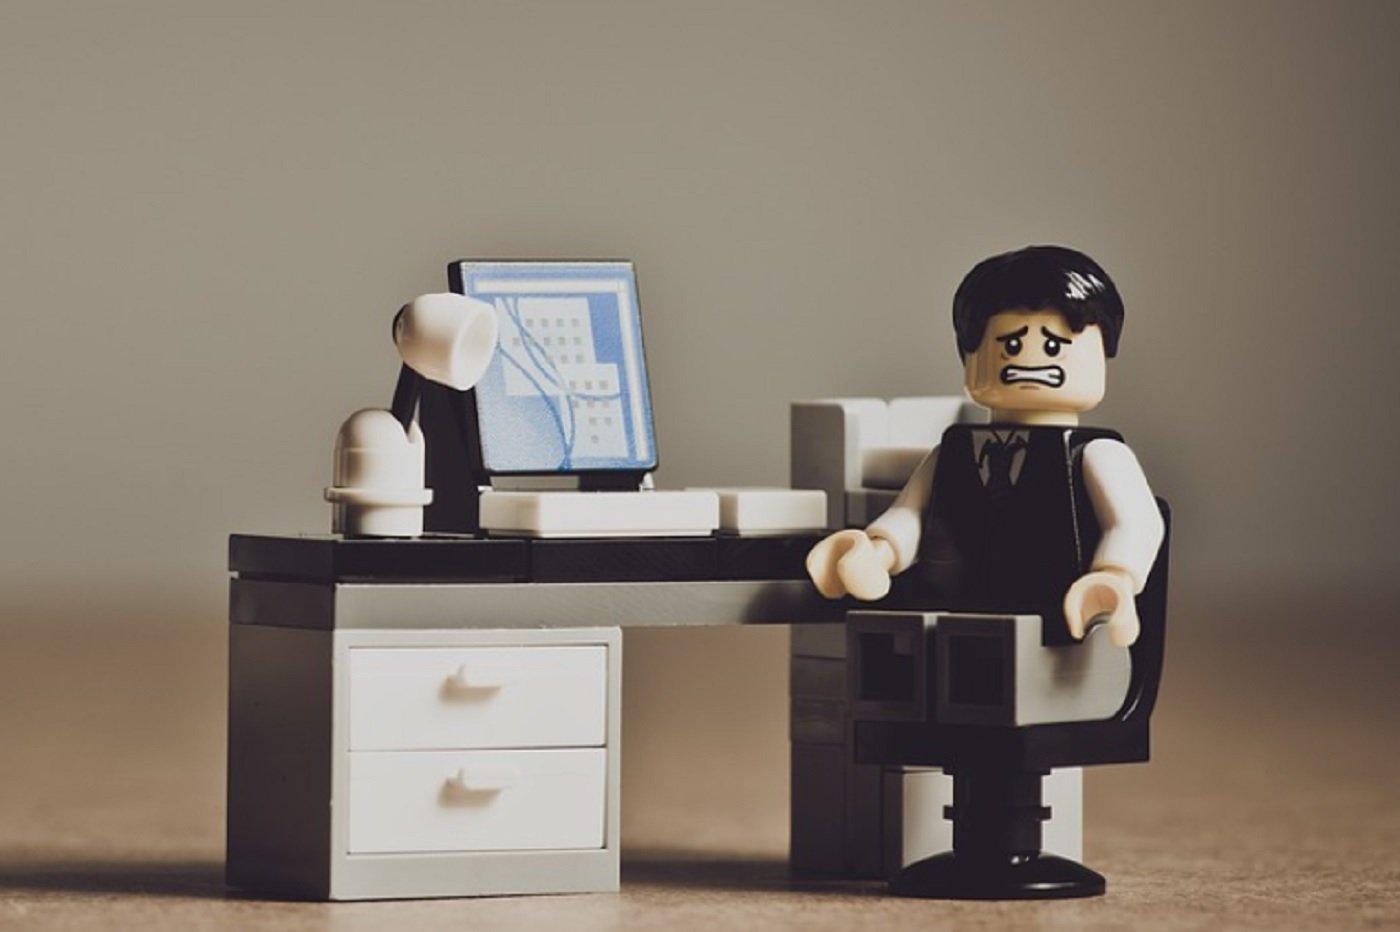 Bureau lego ordinateur travail